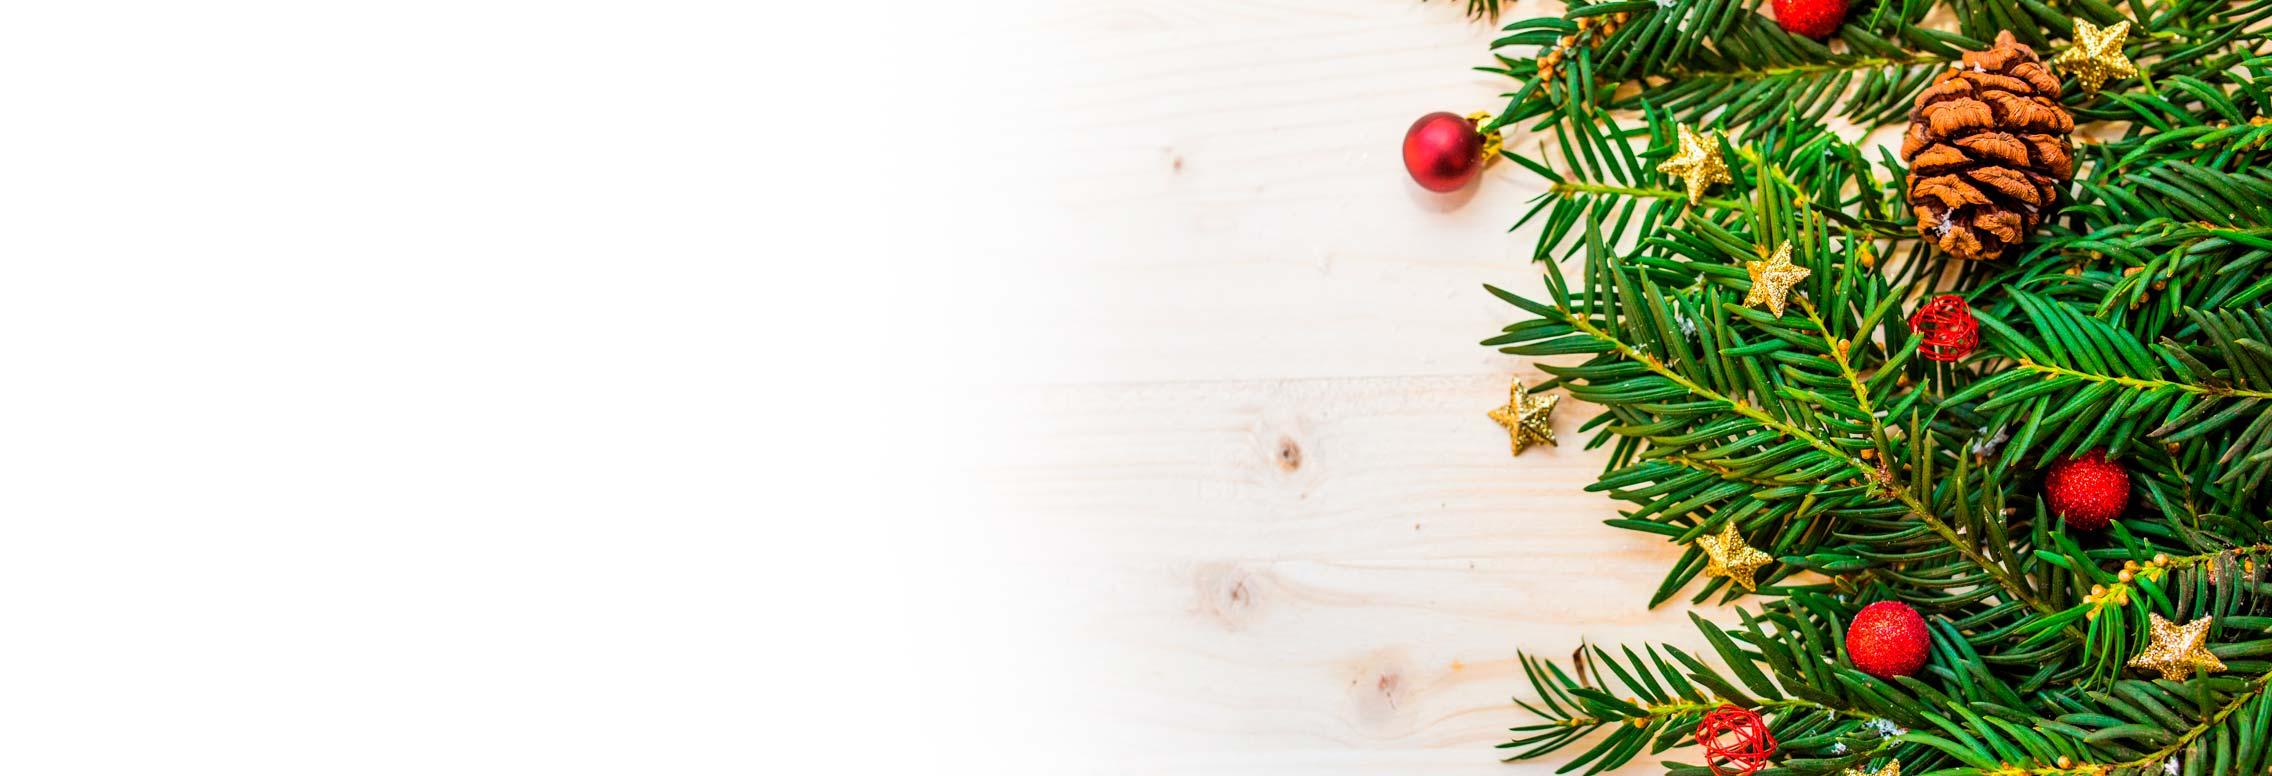 kerstsluiting-van-aken